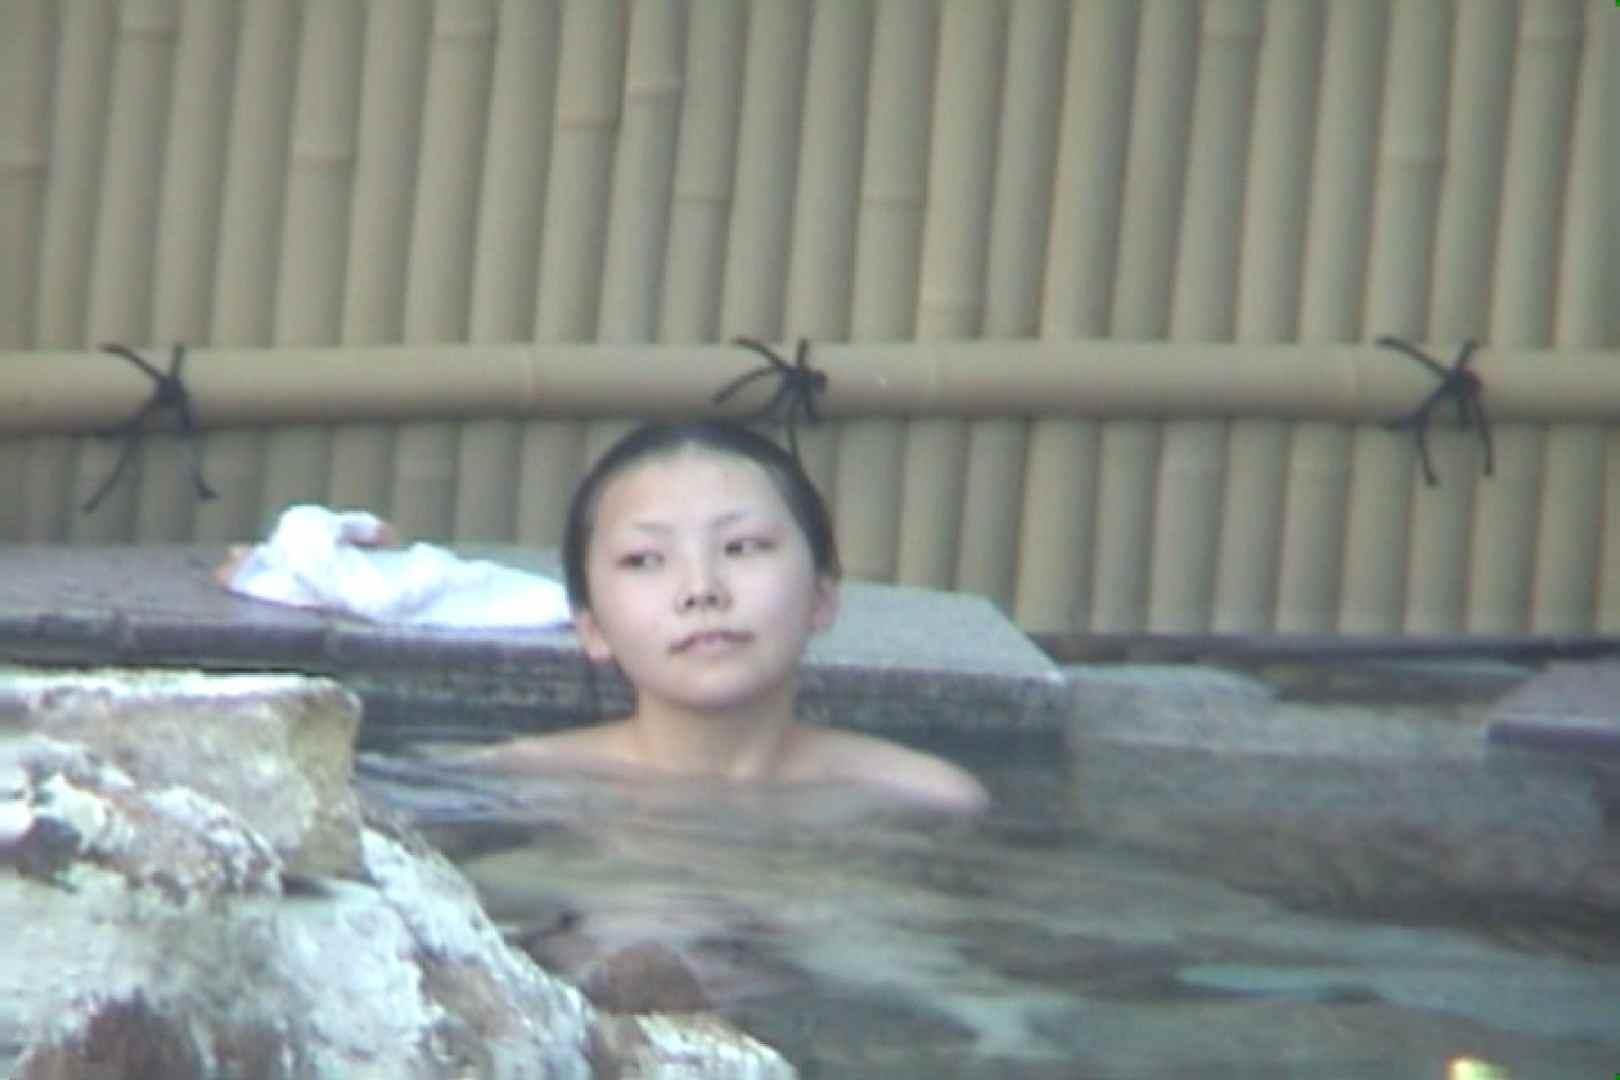 Aquaな露天風呂Vol.572 露天風呂編   盗撮シリーズ  93PIX 25